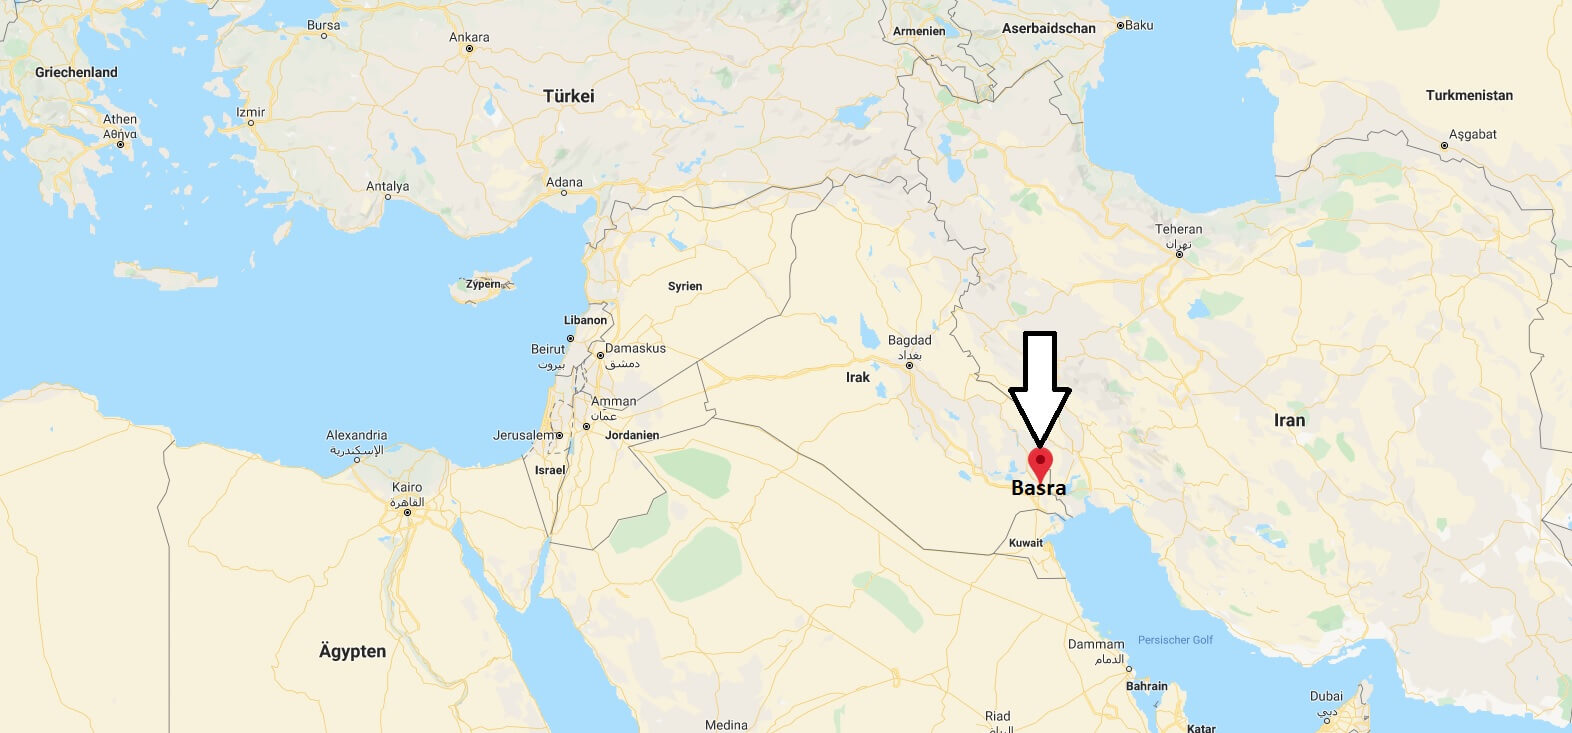 Wo liegt Basra? Wo ist Basra? in welchem land liegt Basra